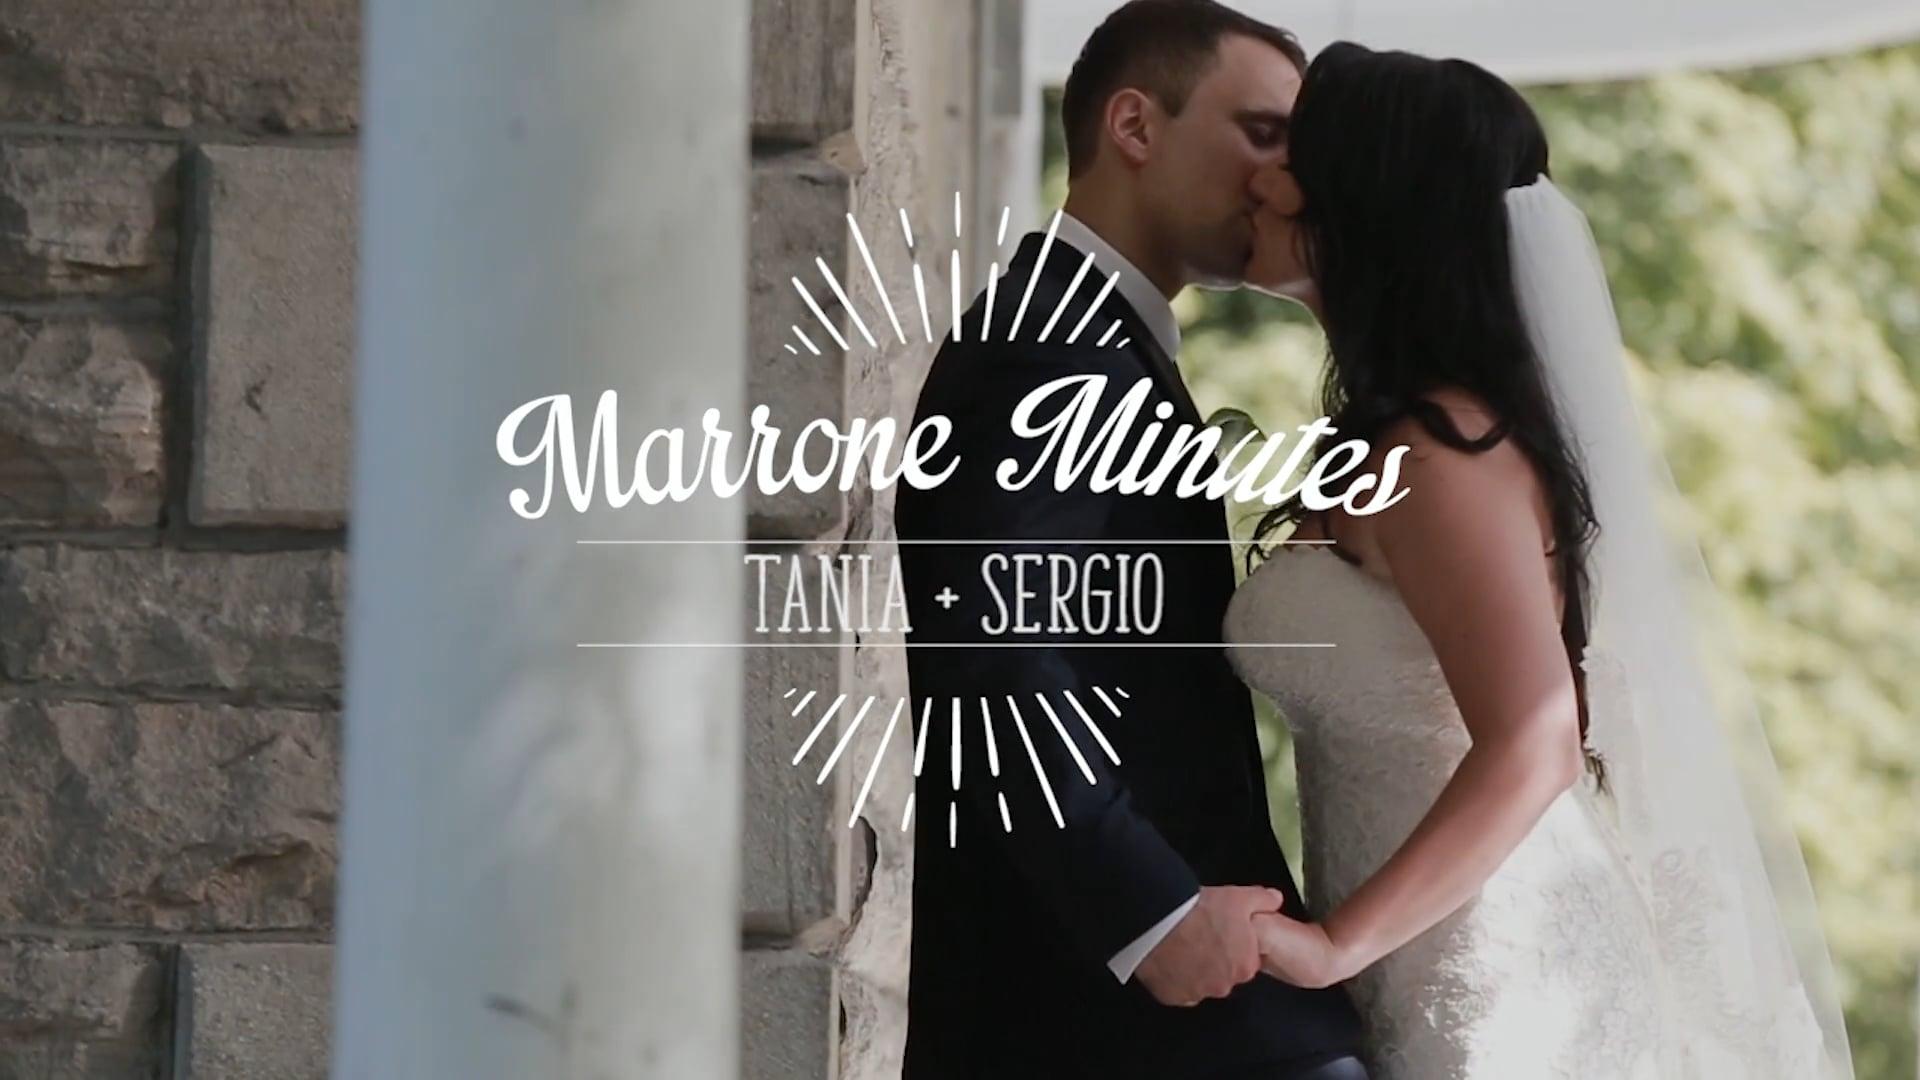 Tania & Sergio ~ Marrone Minutes